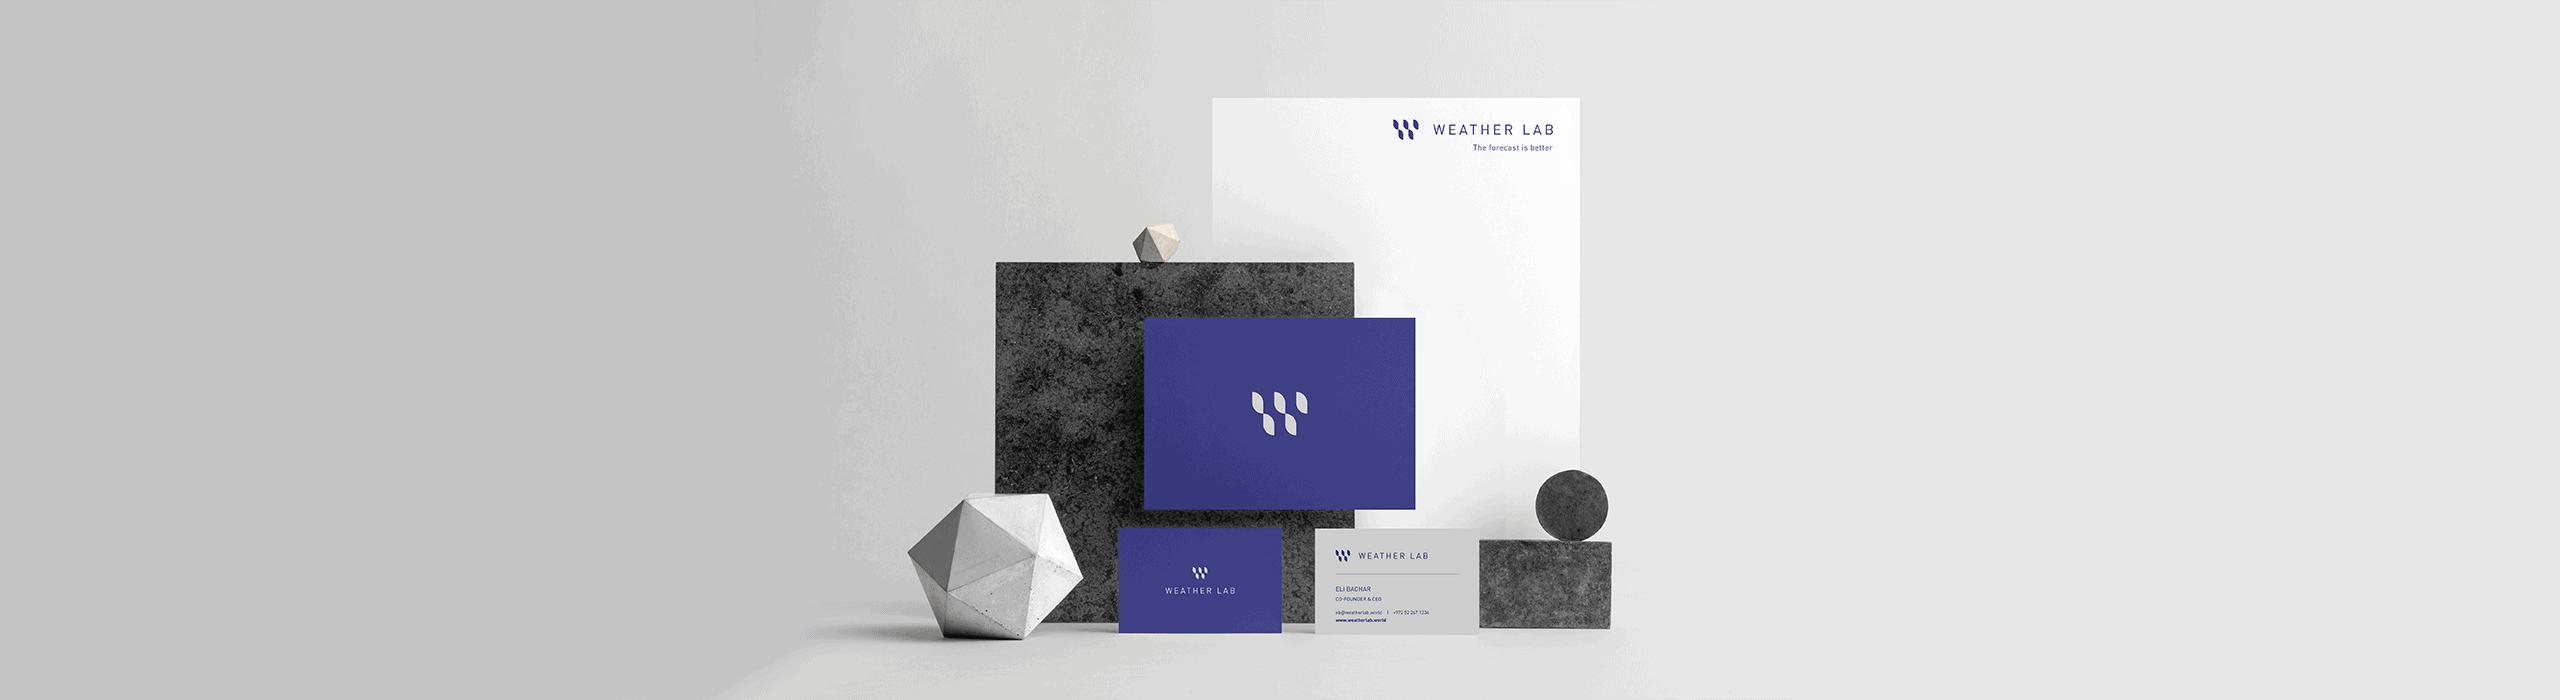 Weather Lab - brand1 - Natie Branding Agency